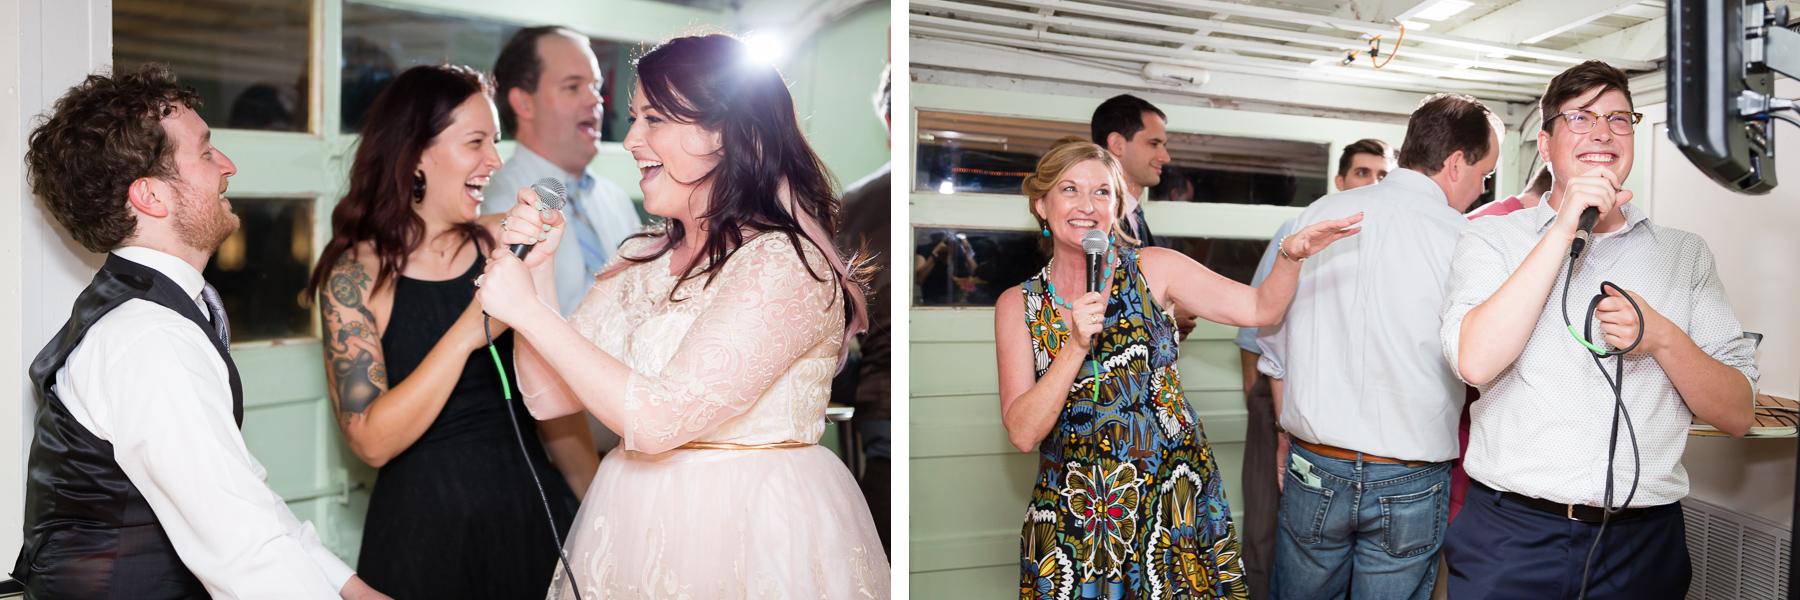 wedding-photographer-and-videographer-team-austin.jpg